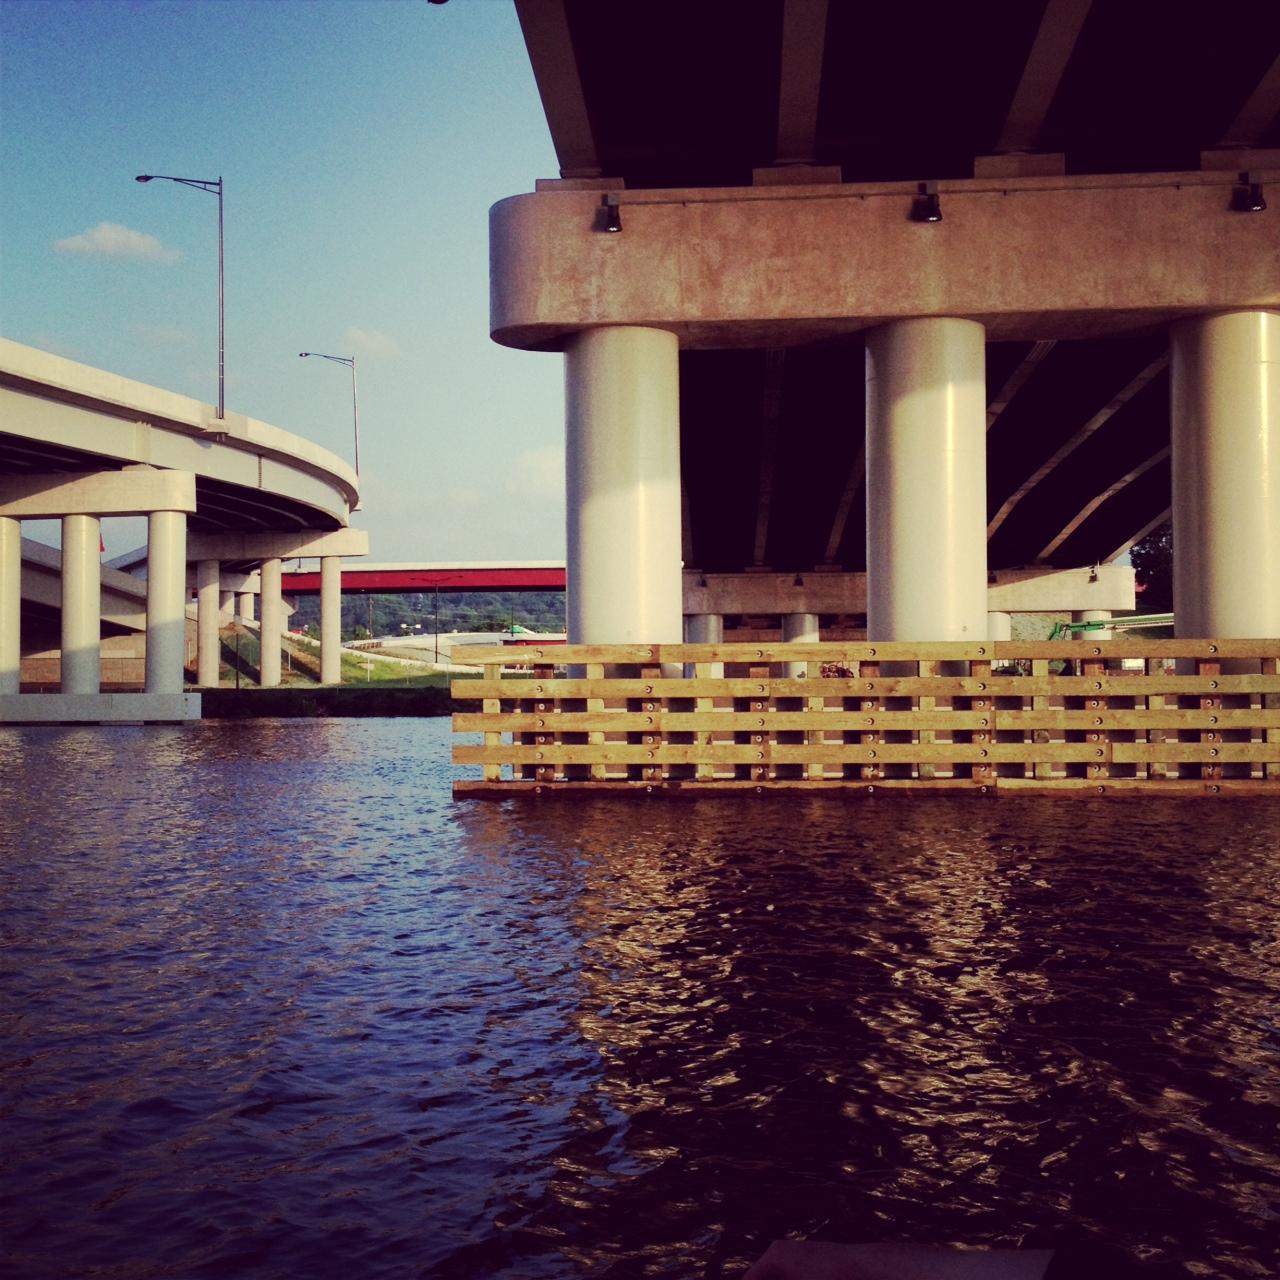 Anacostia River, Washington DC, May 2013. Photo by Kate Gallery